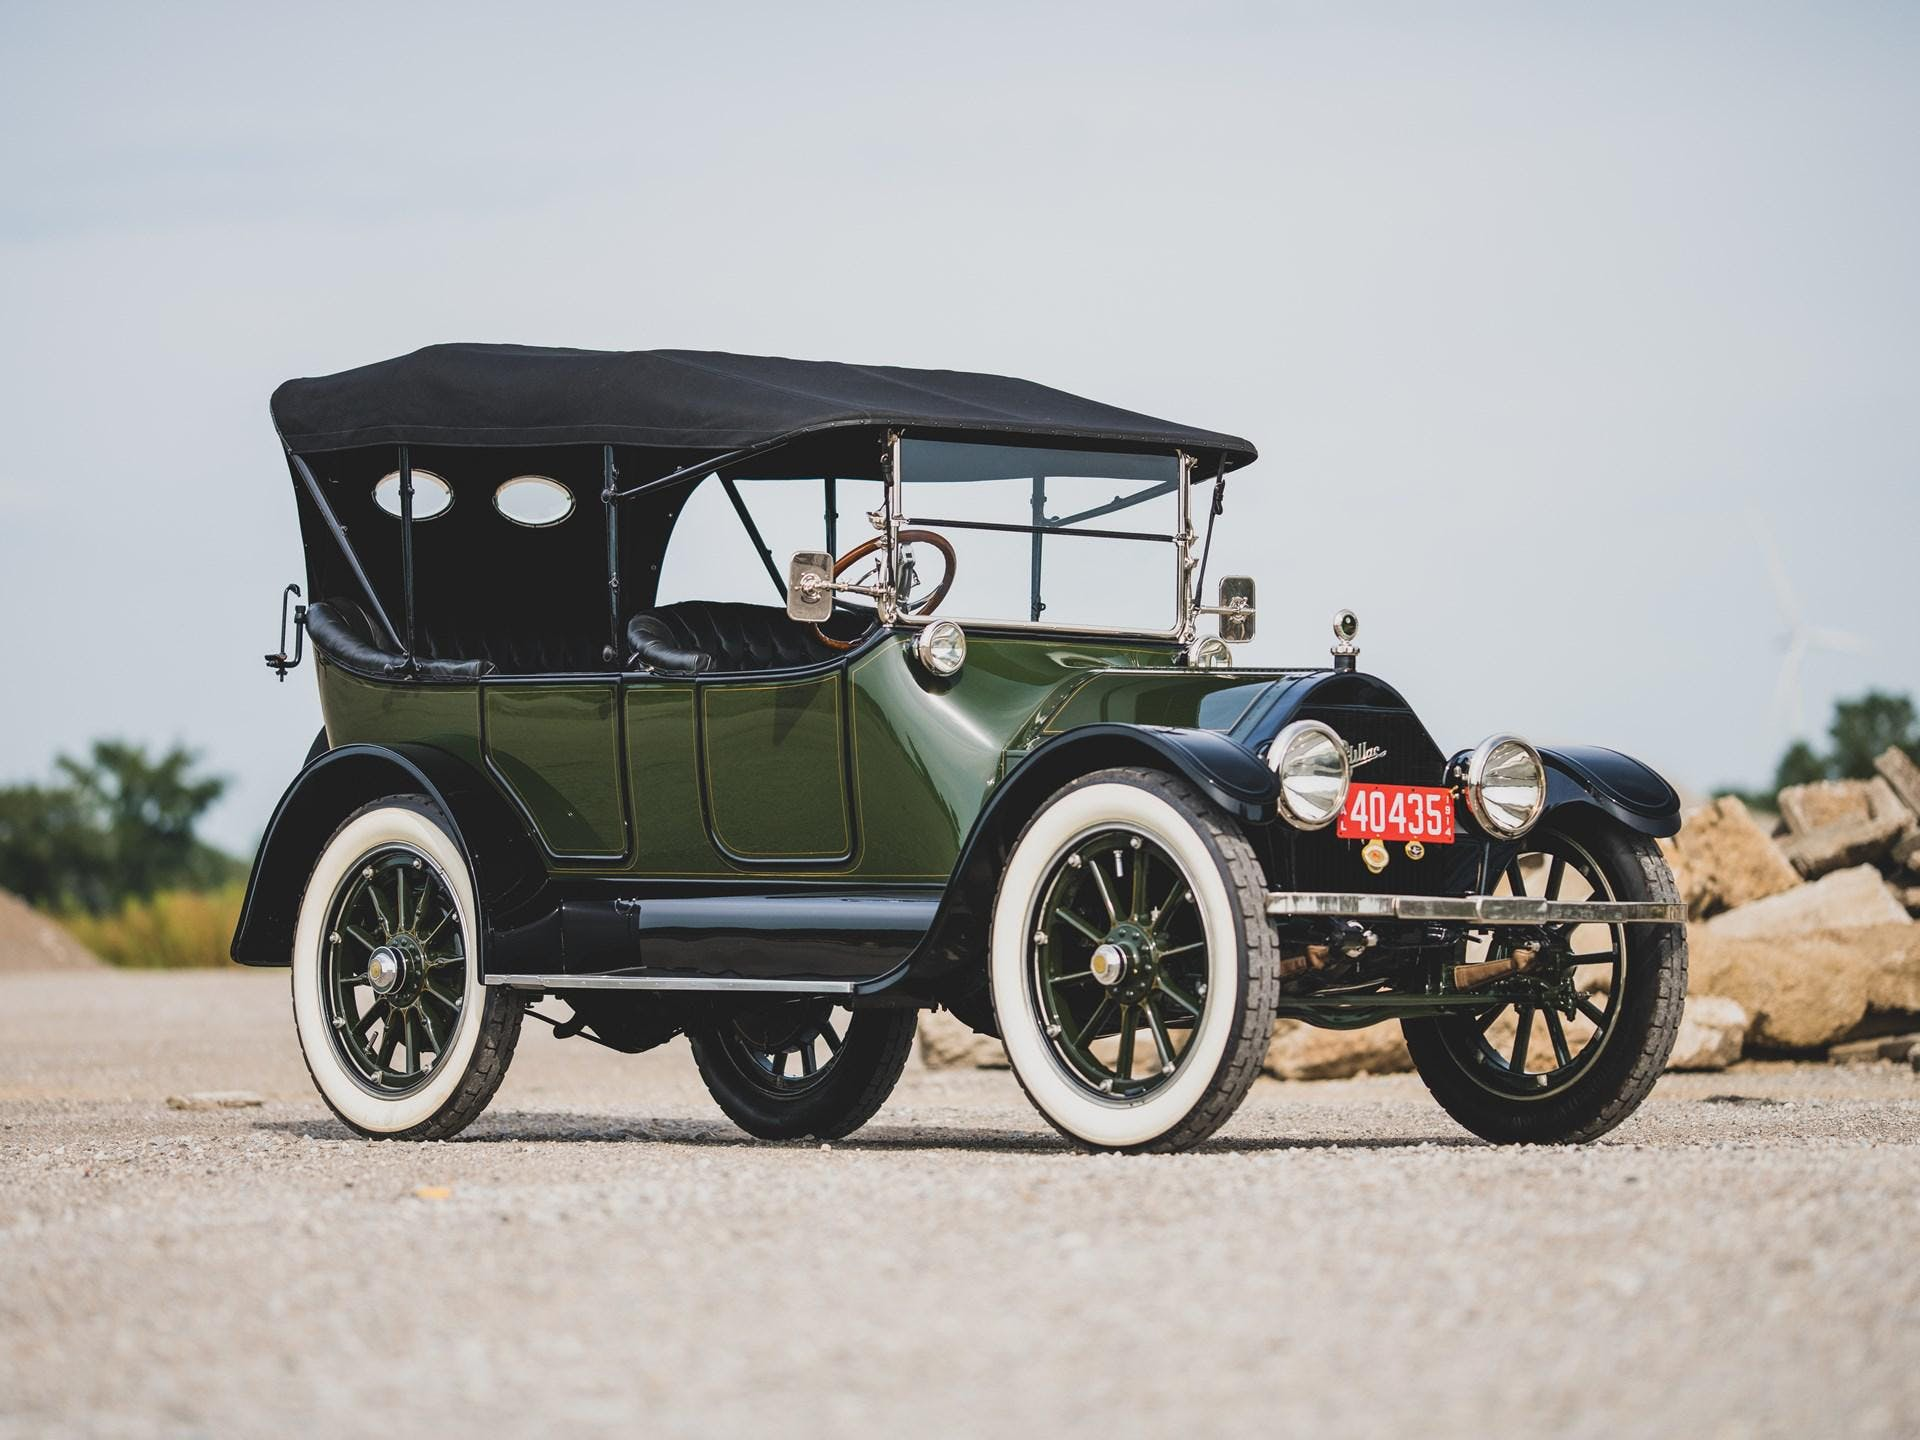 1914 Cadillac Model 30 Five-Passenger Touring